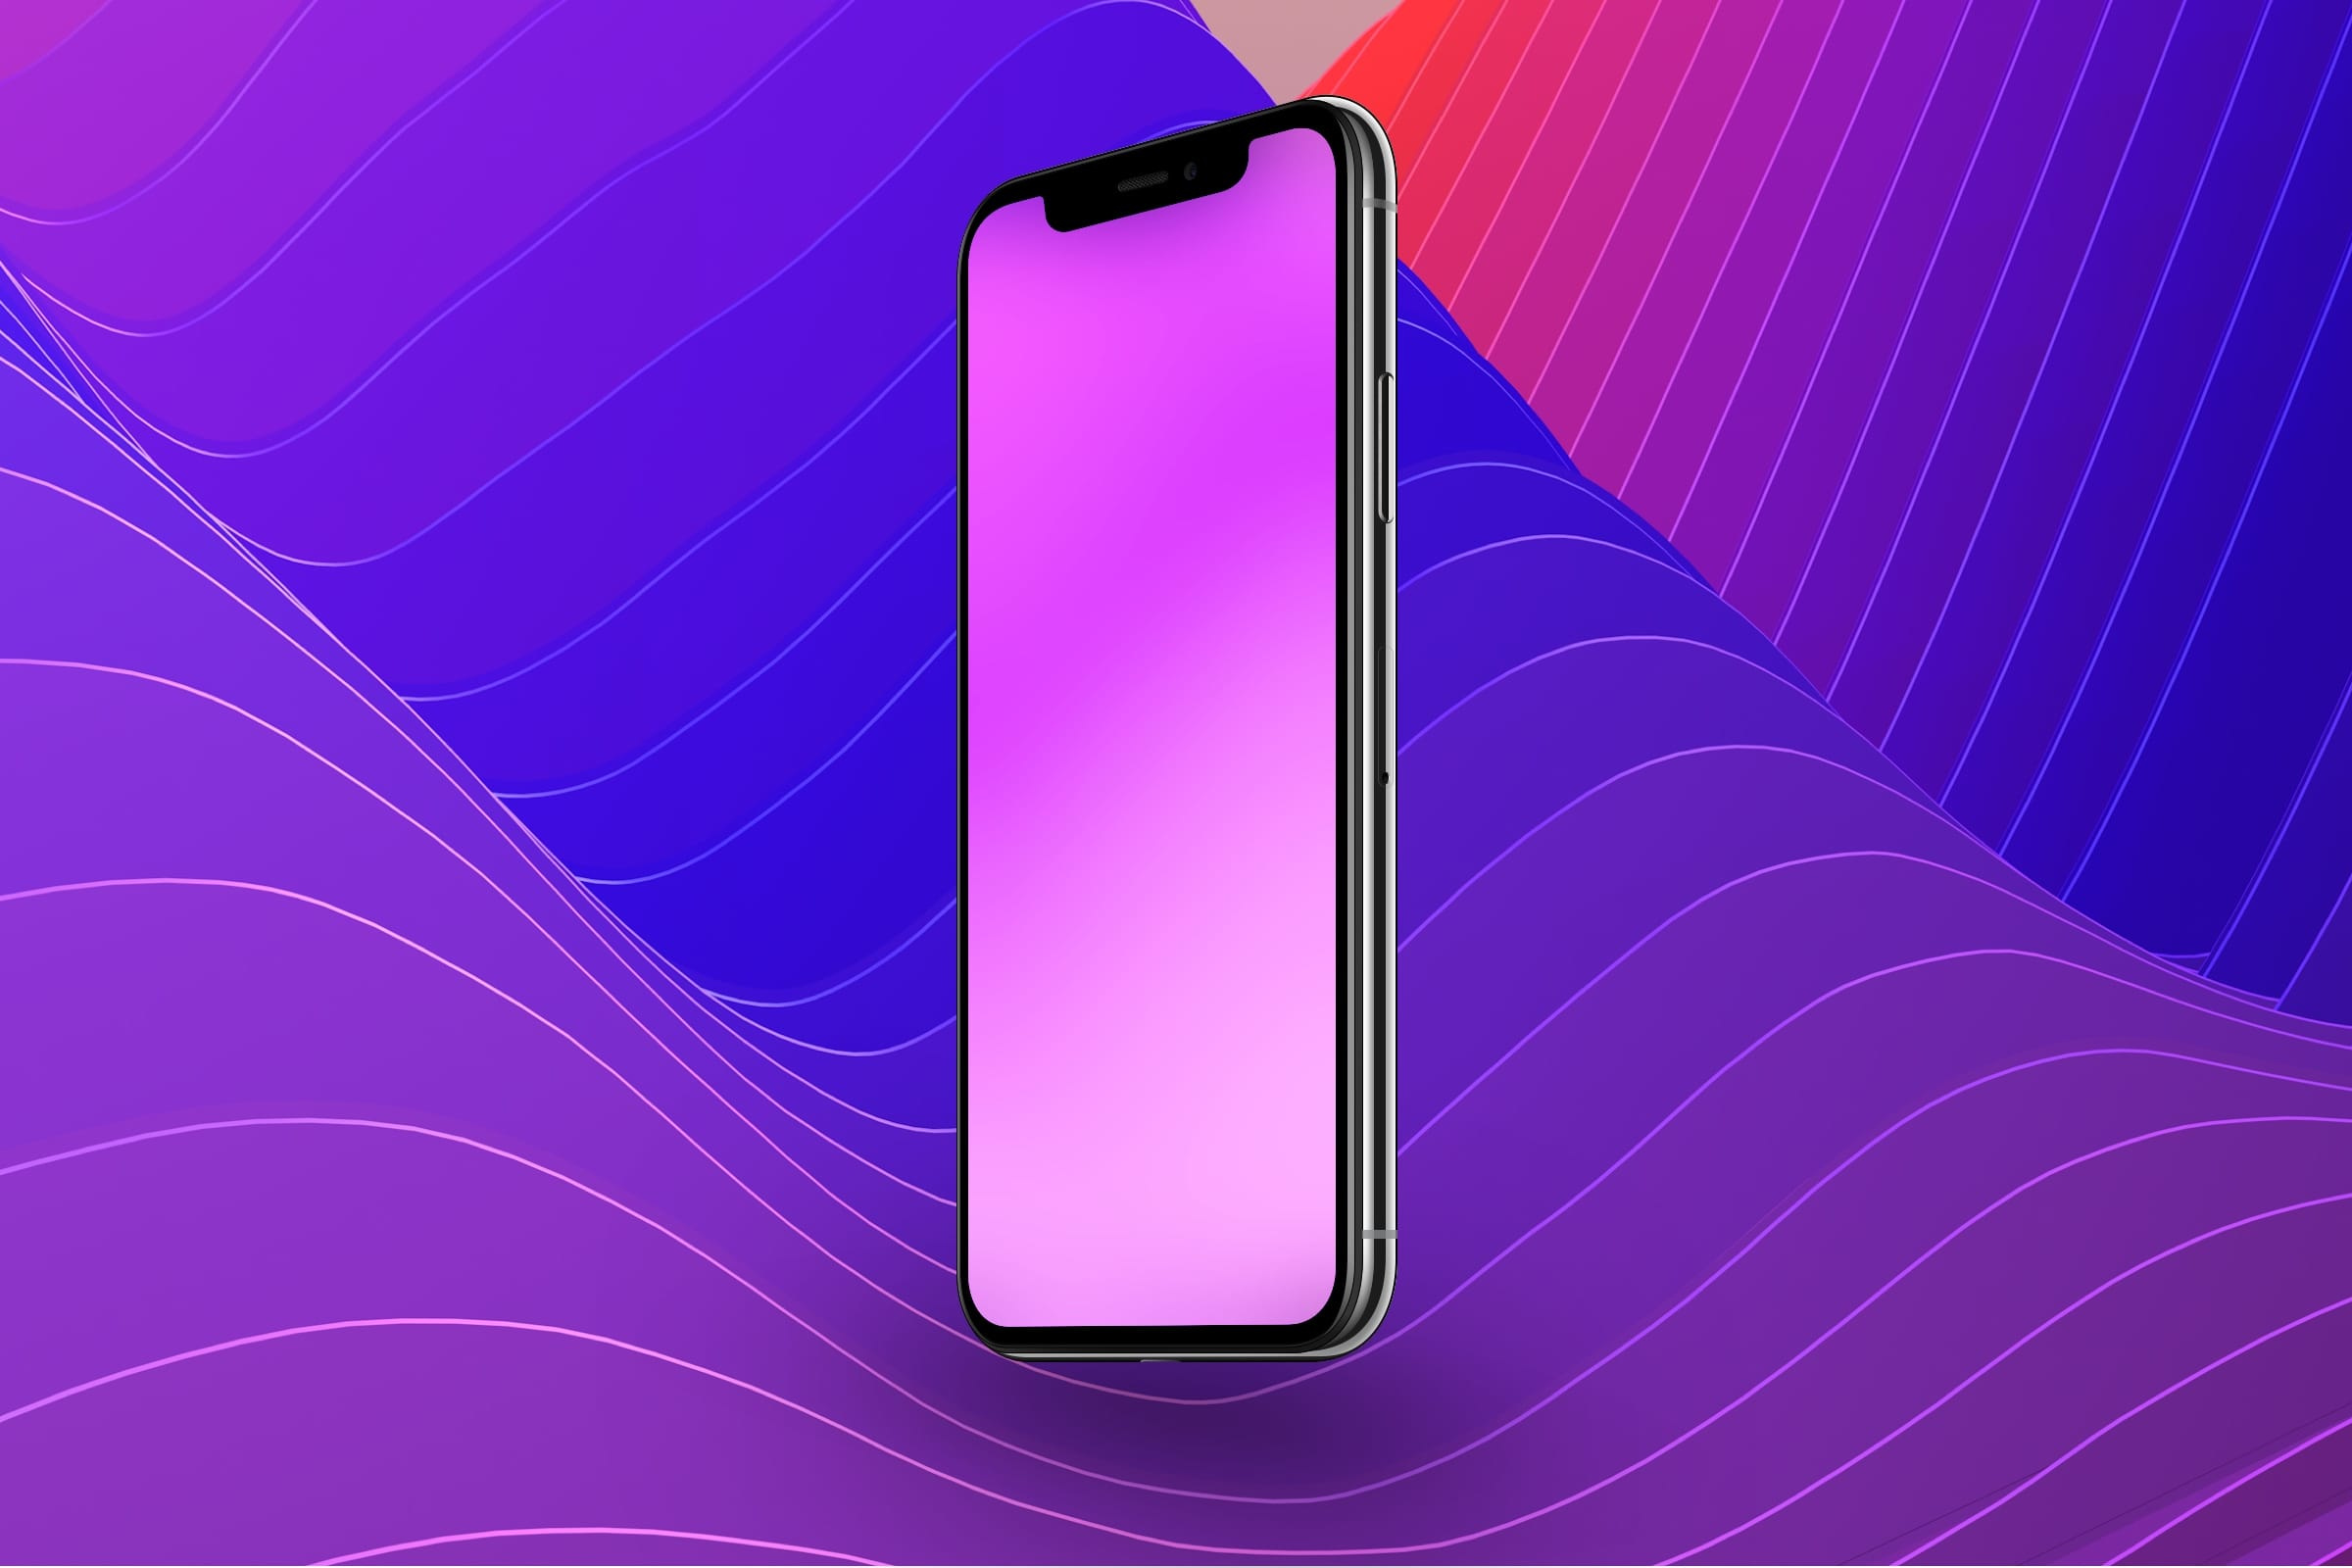 Learn iOS 11 Design - Design+Code